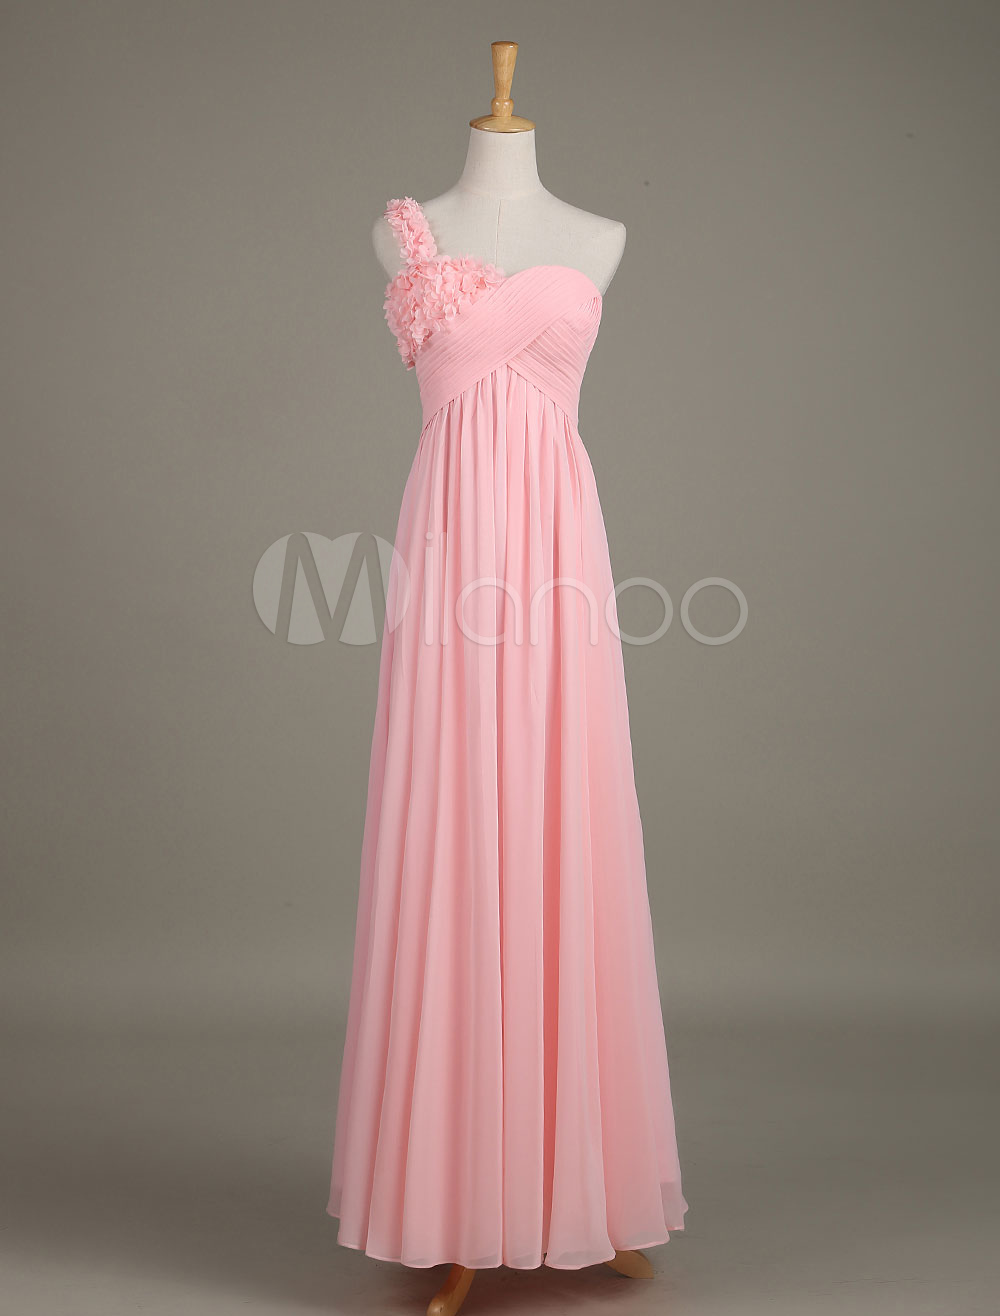 Blush Bridesmaid Dress Soft Pink One Shoulder Flower Chiffon Draped A Line Maxi Wedding Party Dress photo